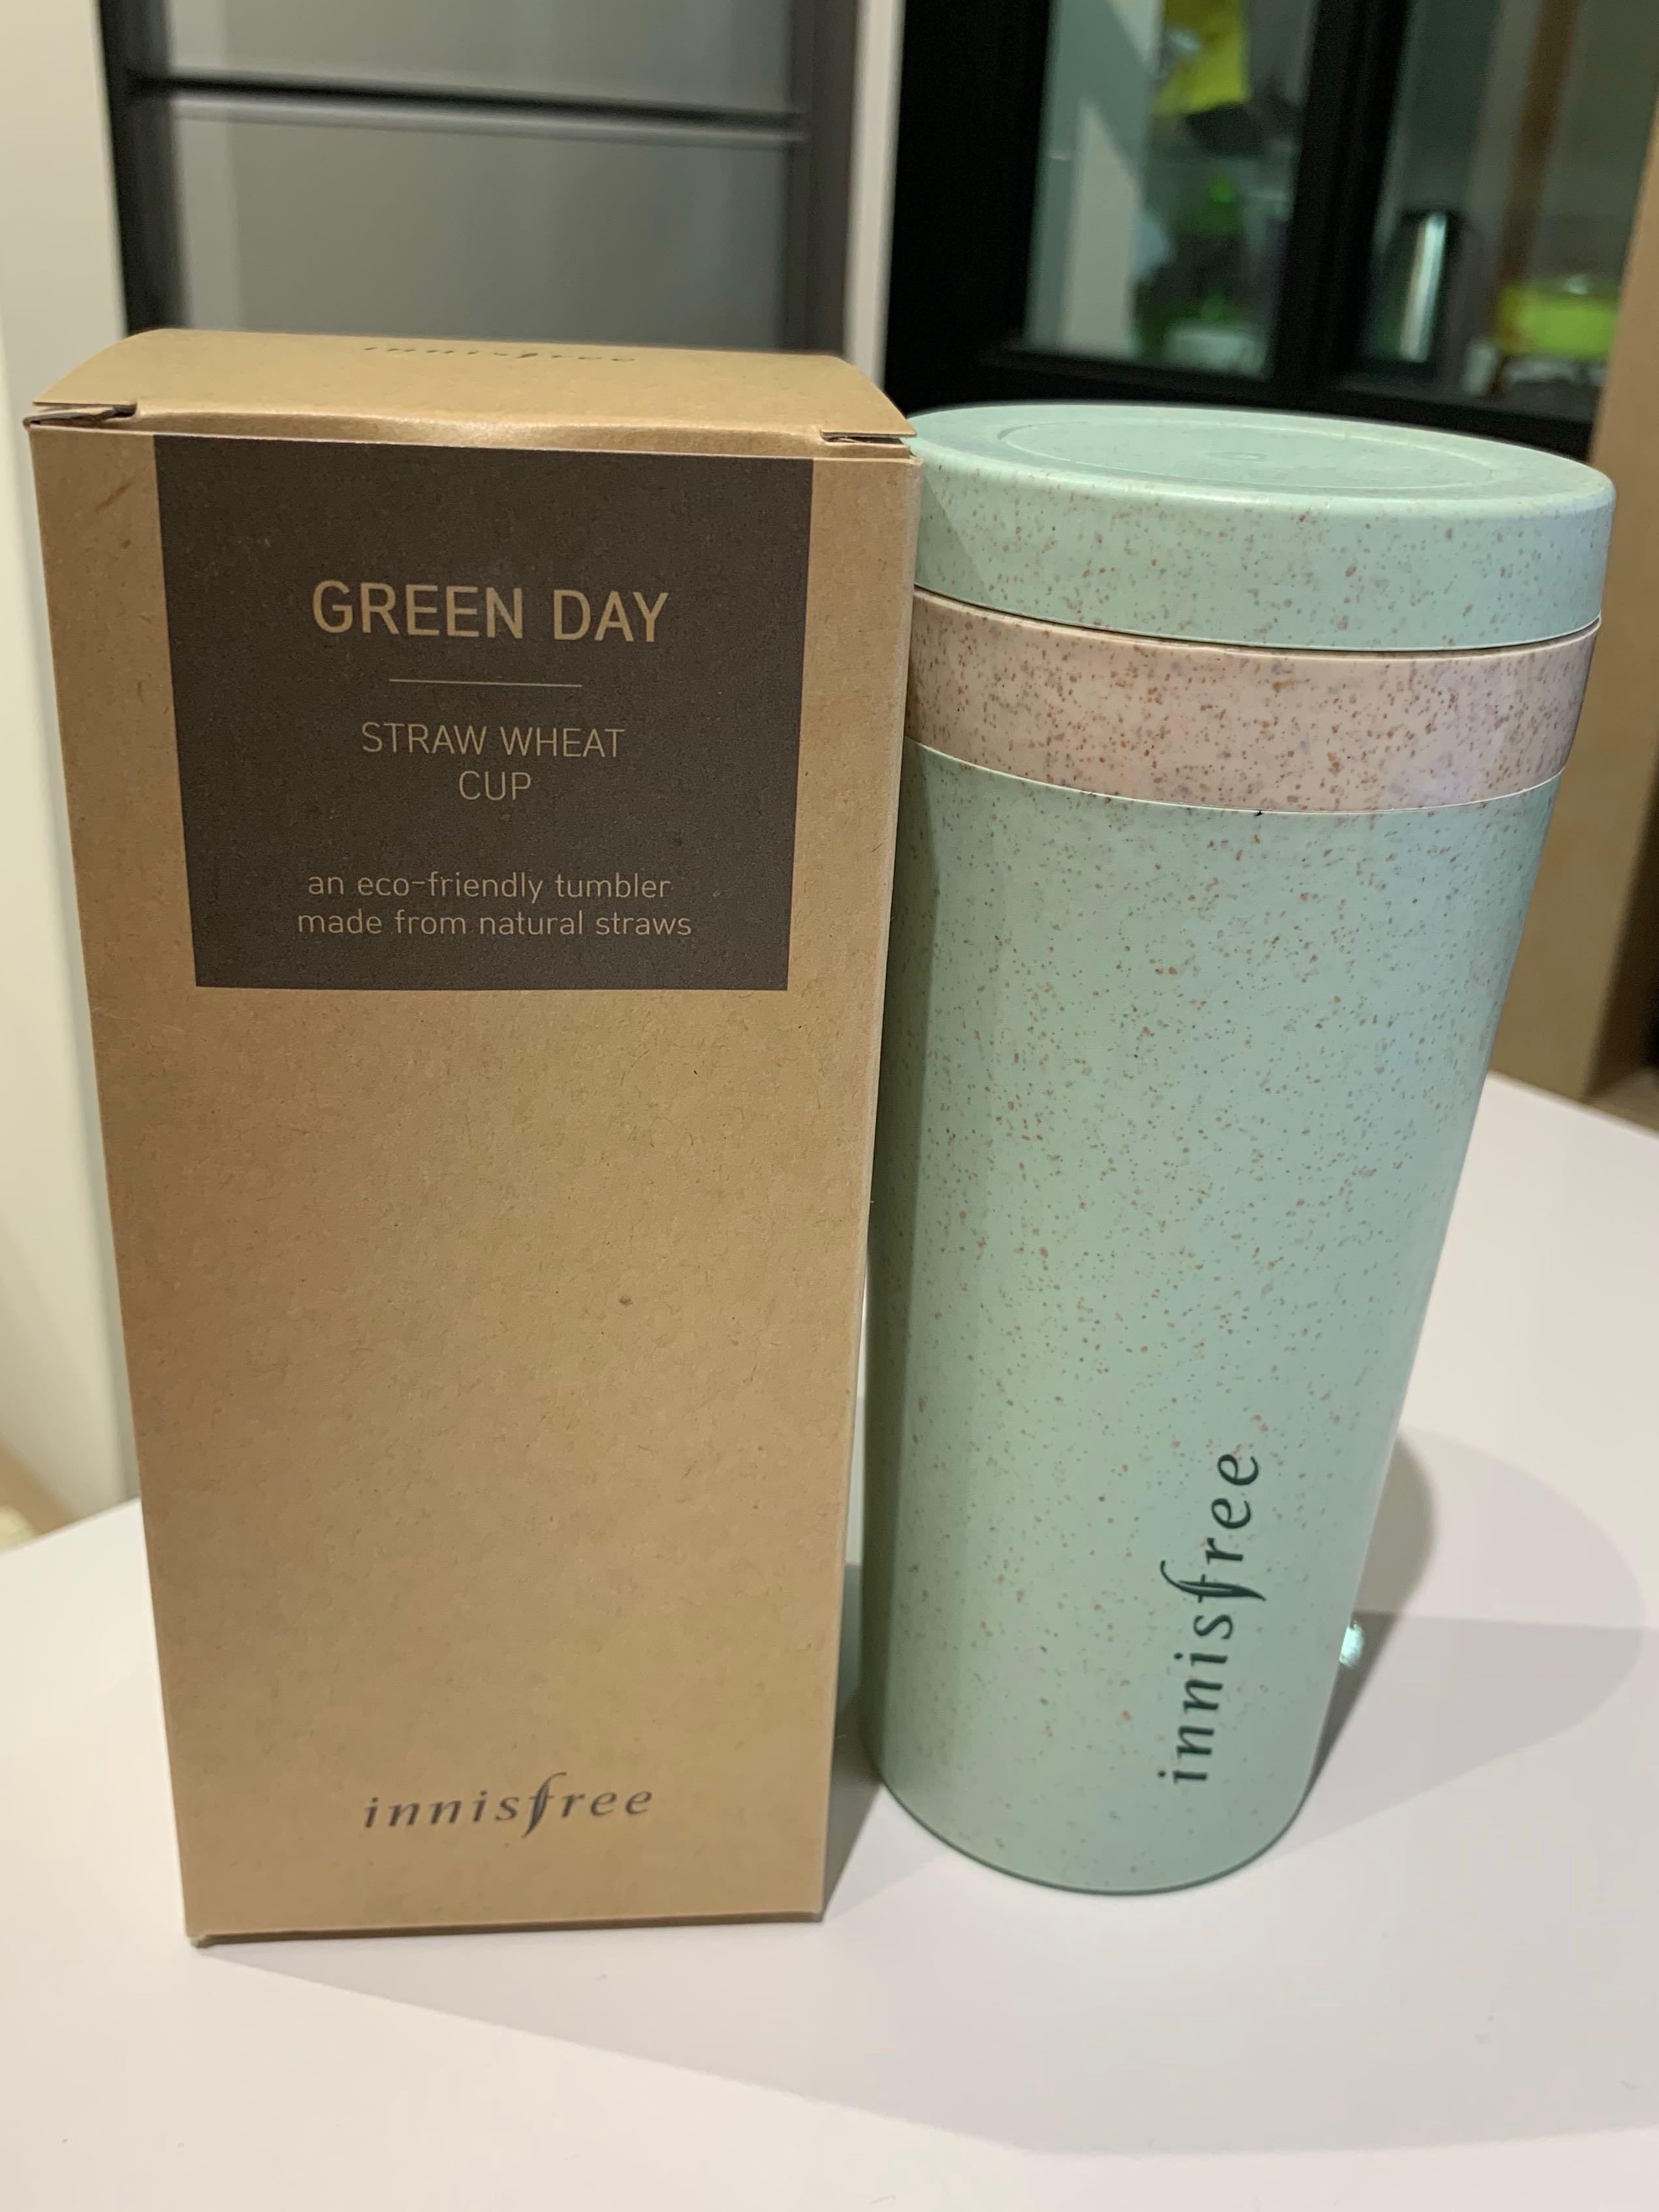 Innisfree 環保杯 Straw Wheat Cup